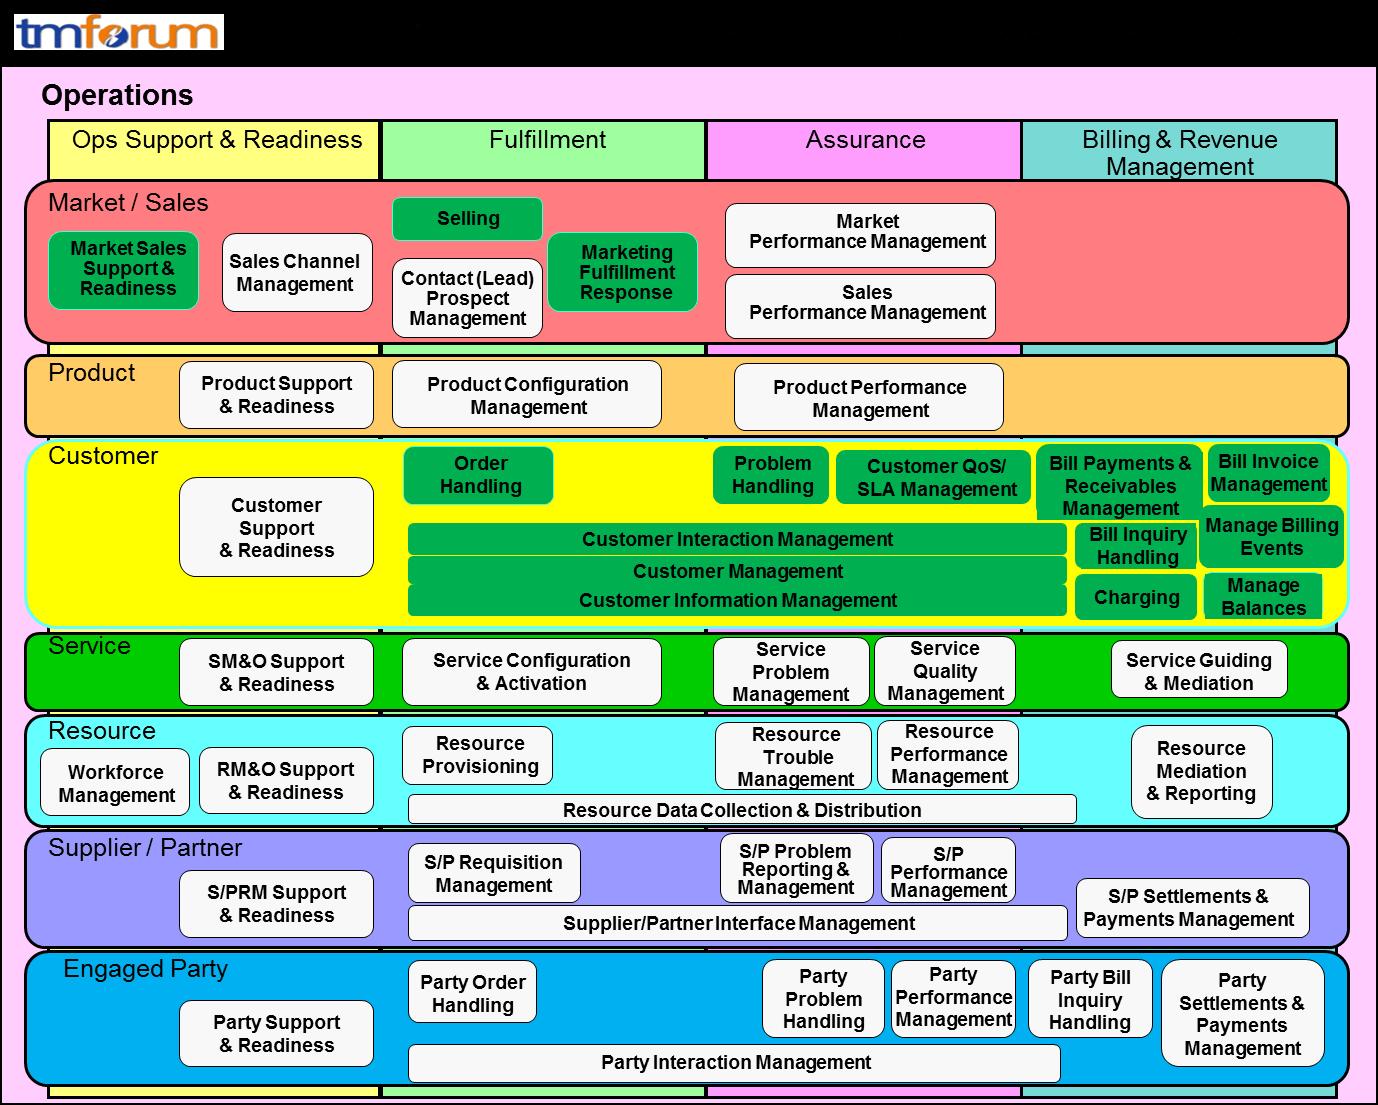 Telefnica business process blueprint design tm forum scope of assessment business process framework footprint malvernweather Choice Image